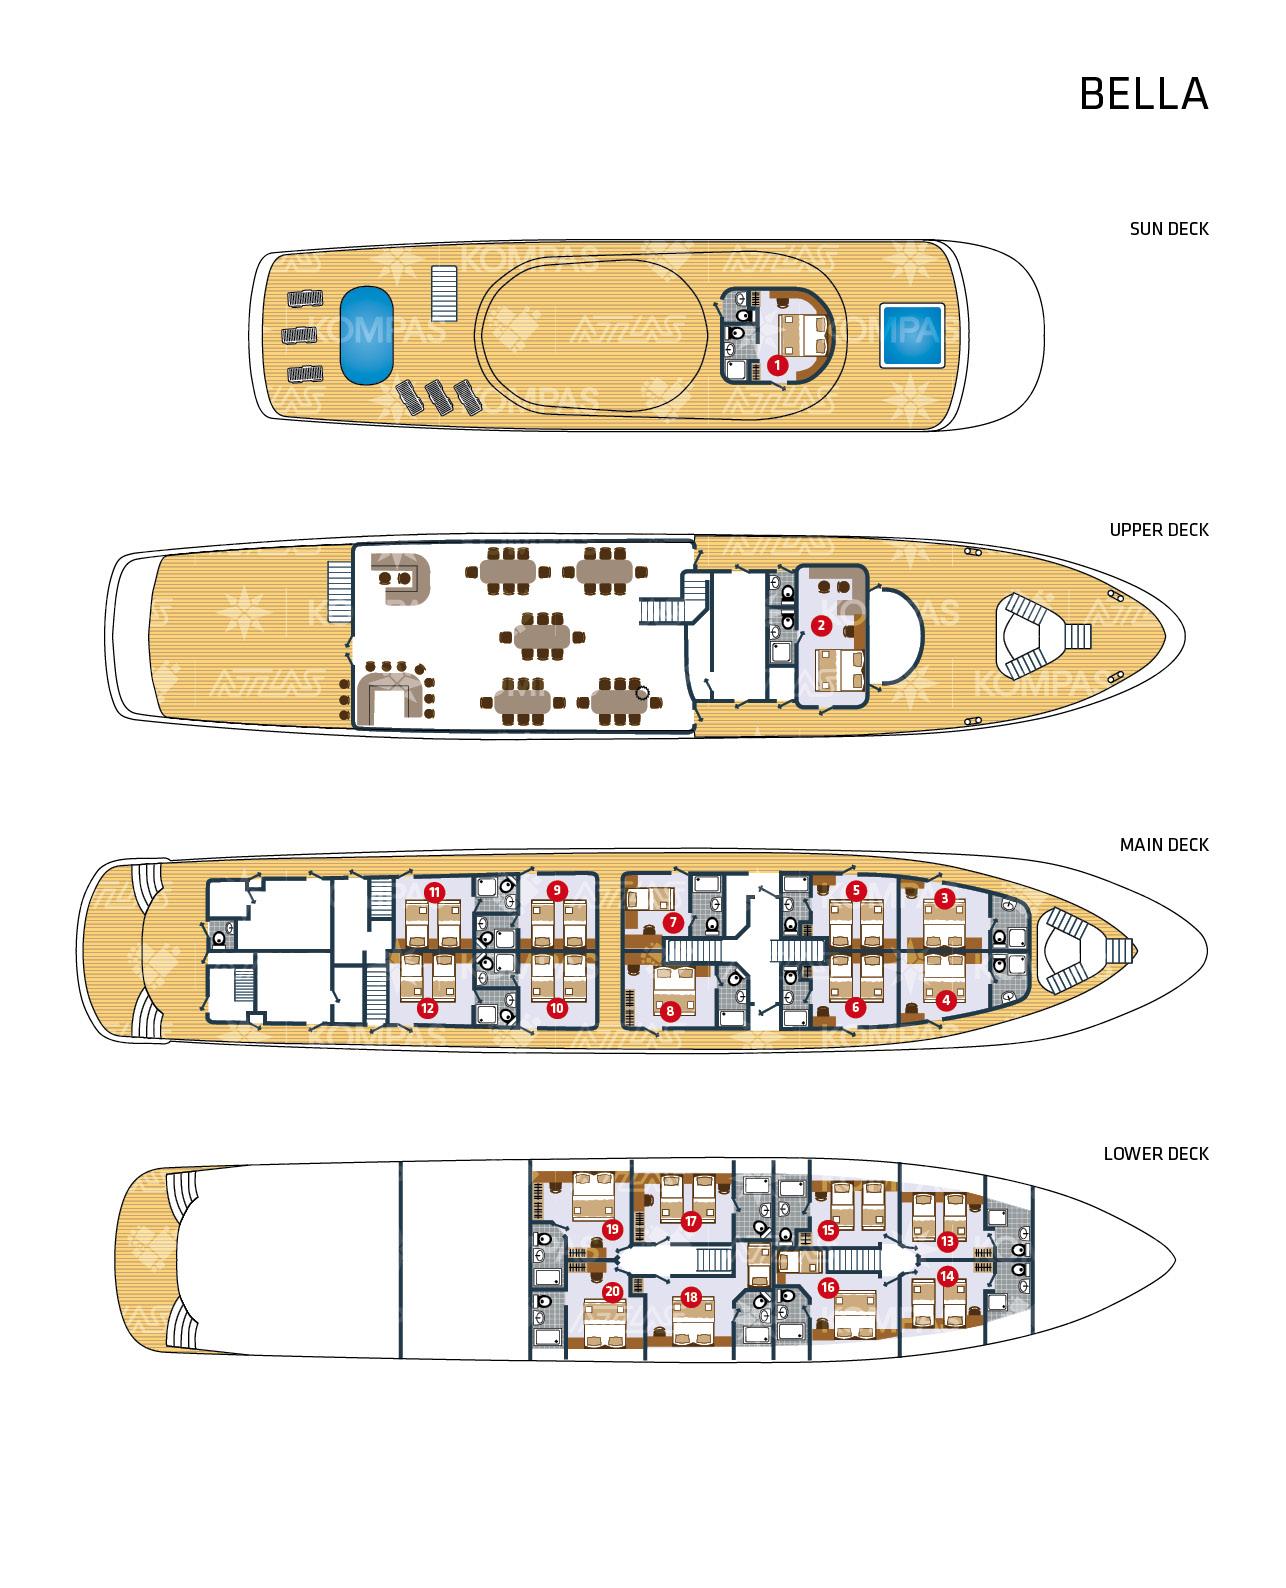 MS Bella Deck Plan